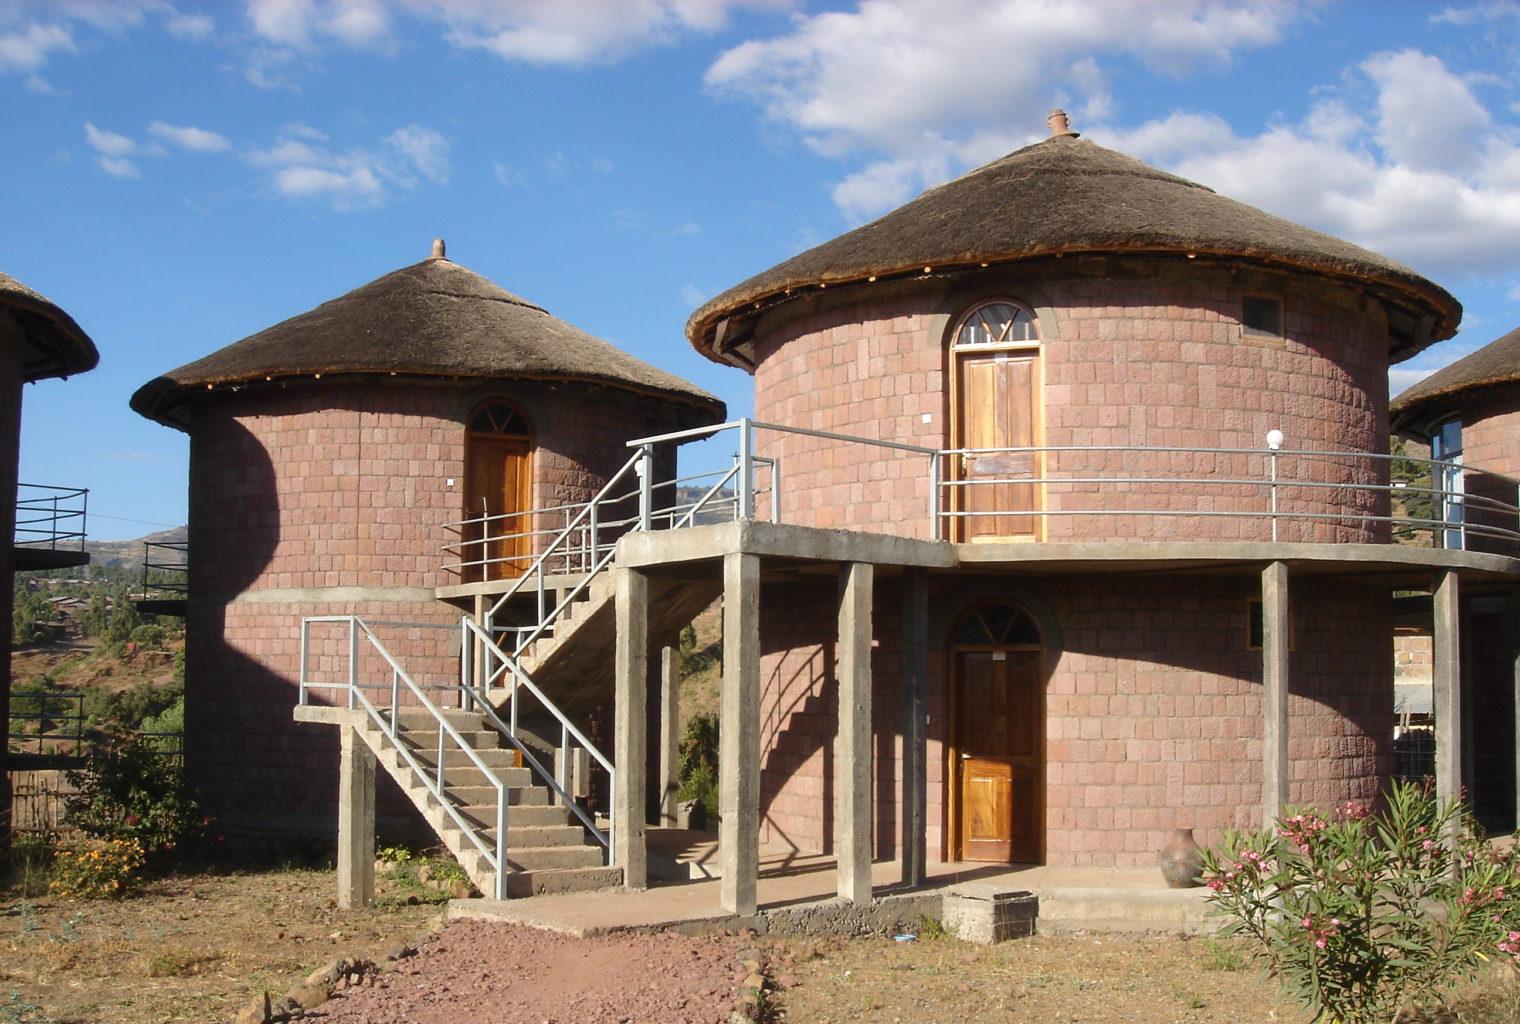 Tukul Village Ethiopia Exterior